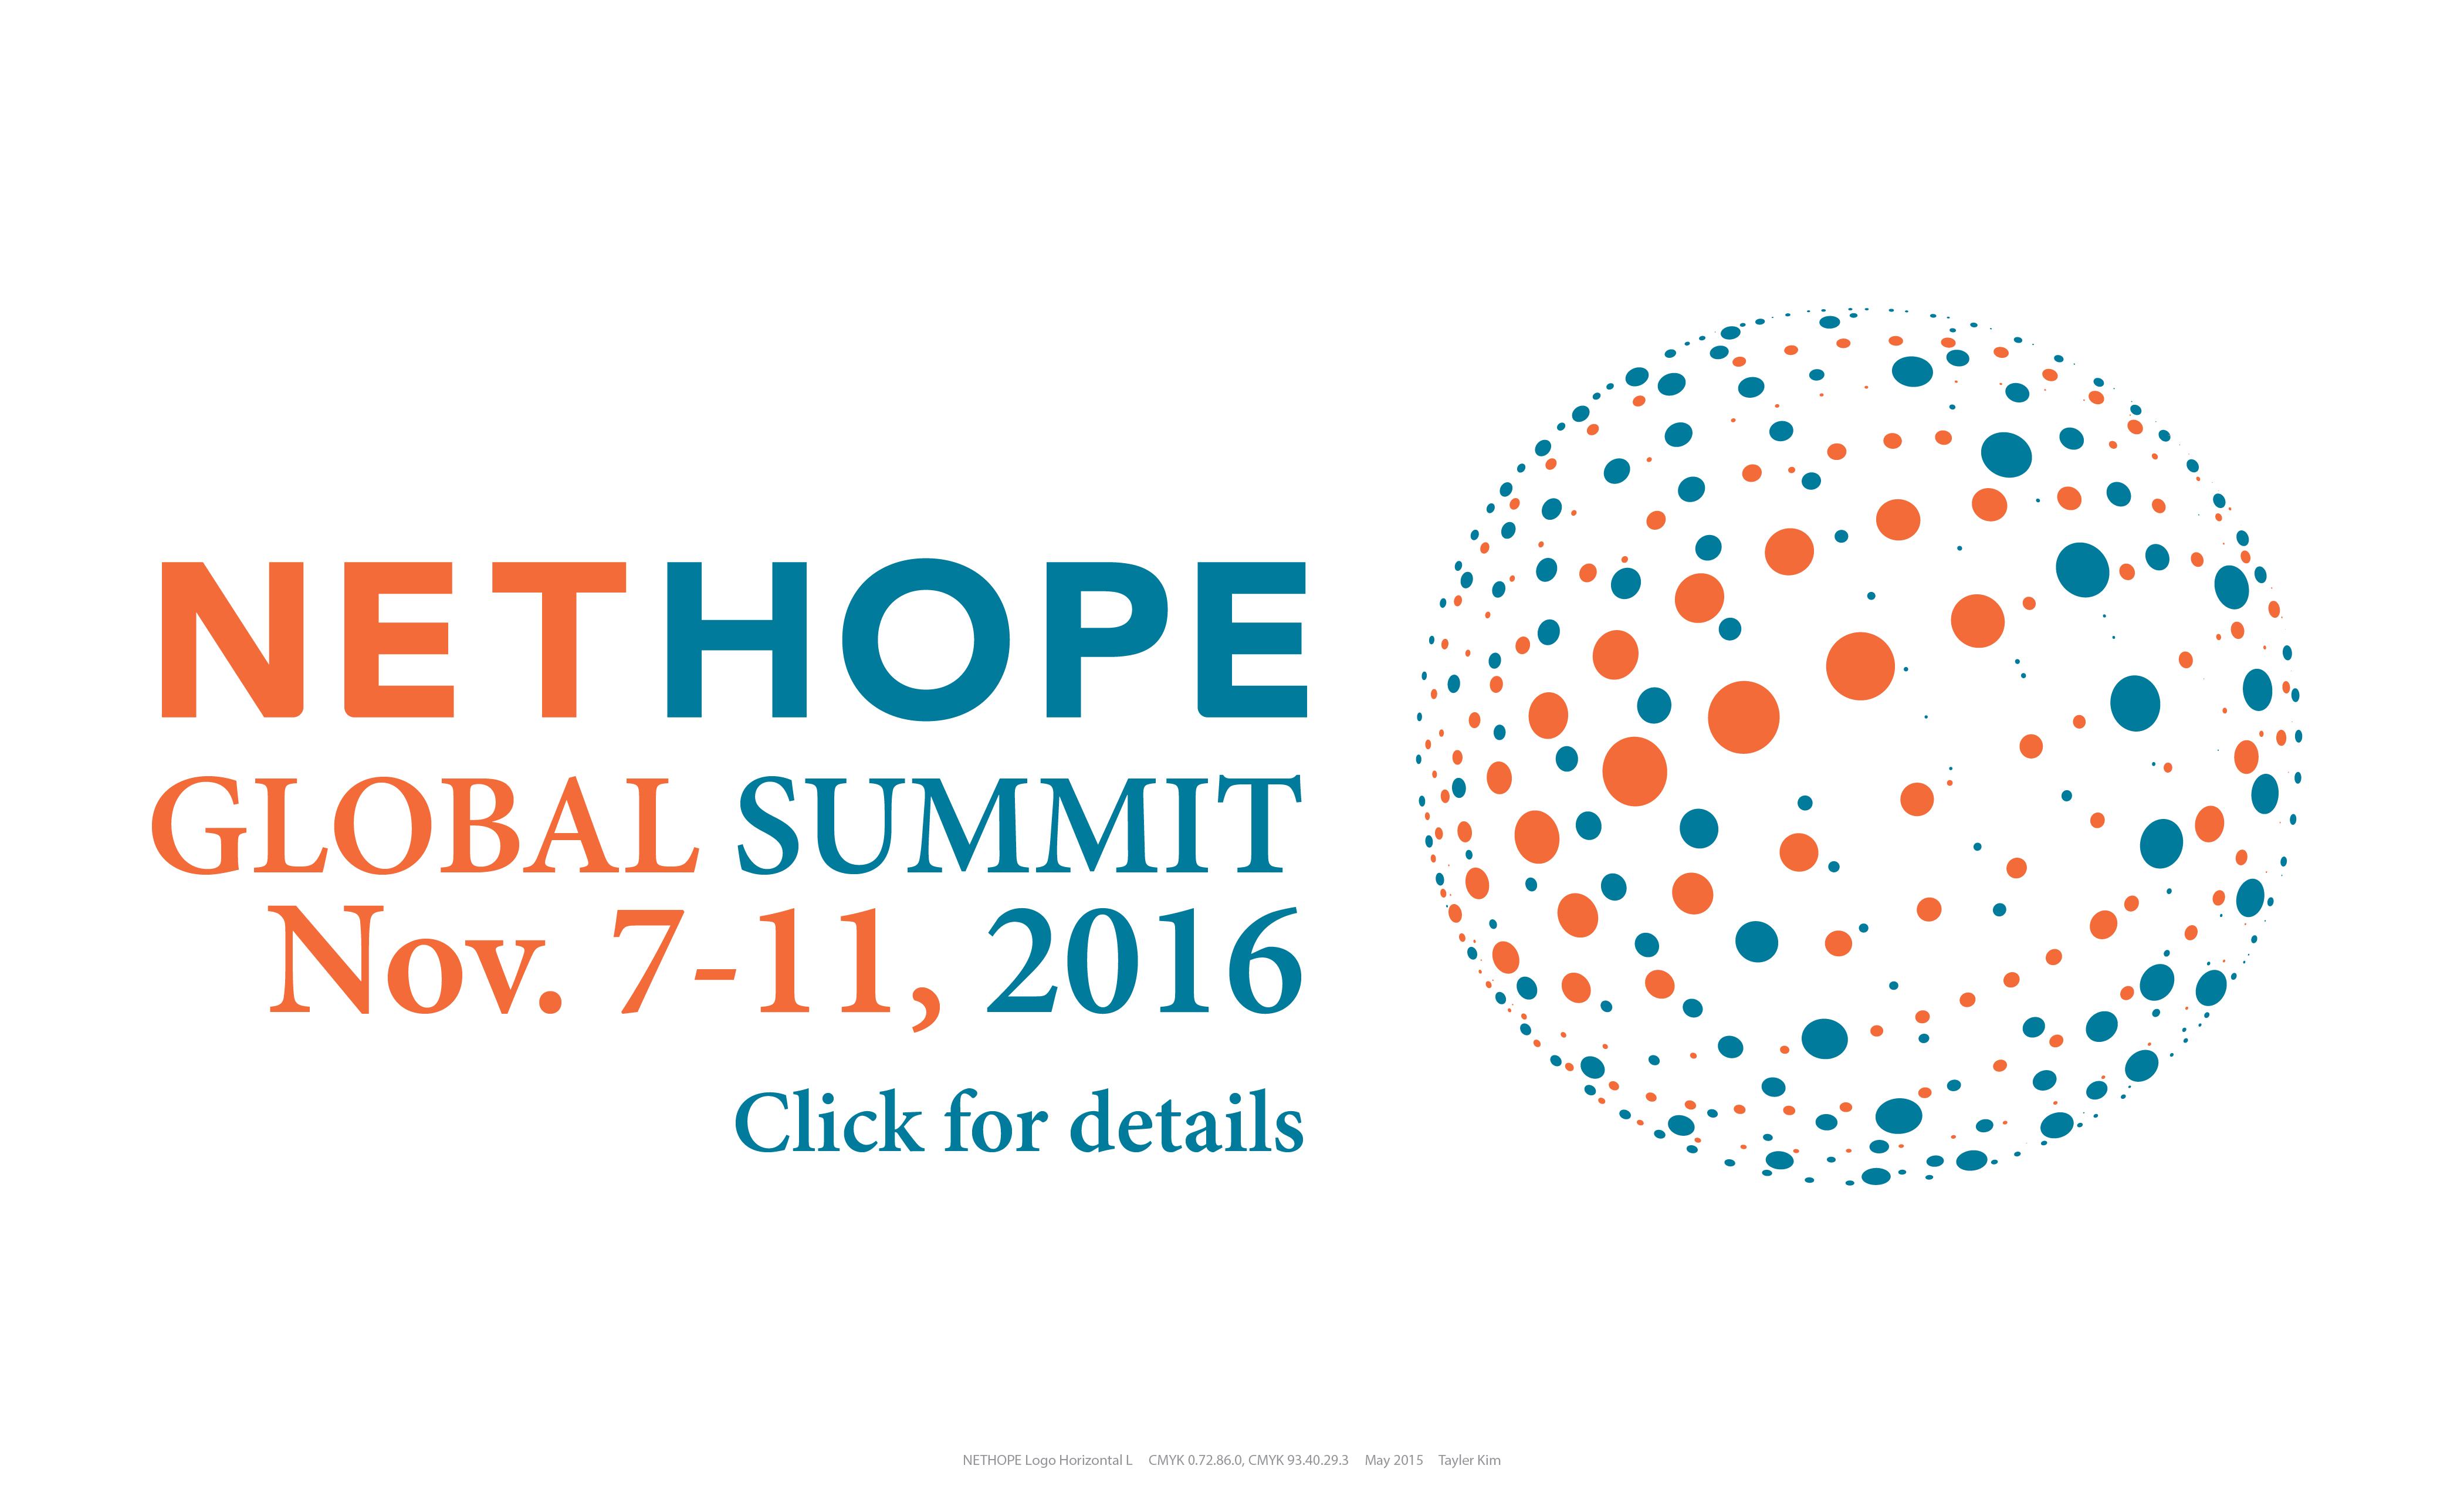 NetHope Global Summit 2016